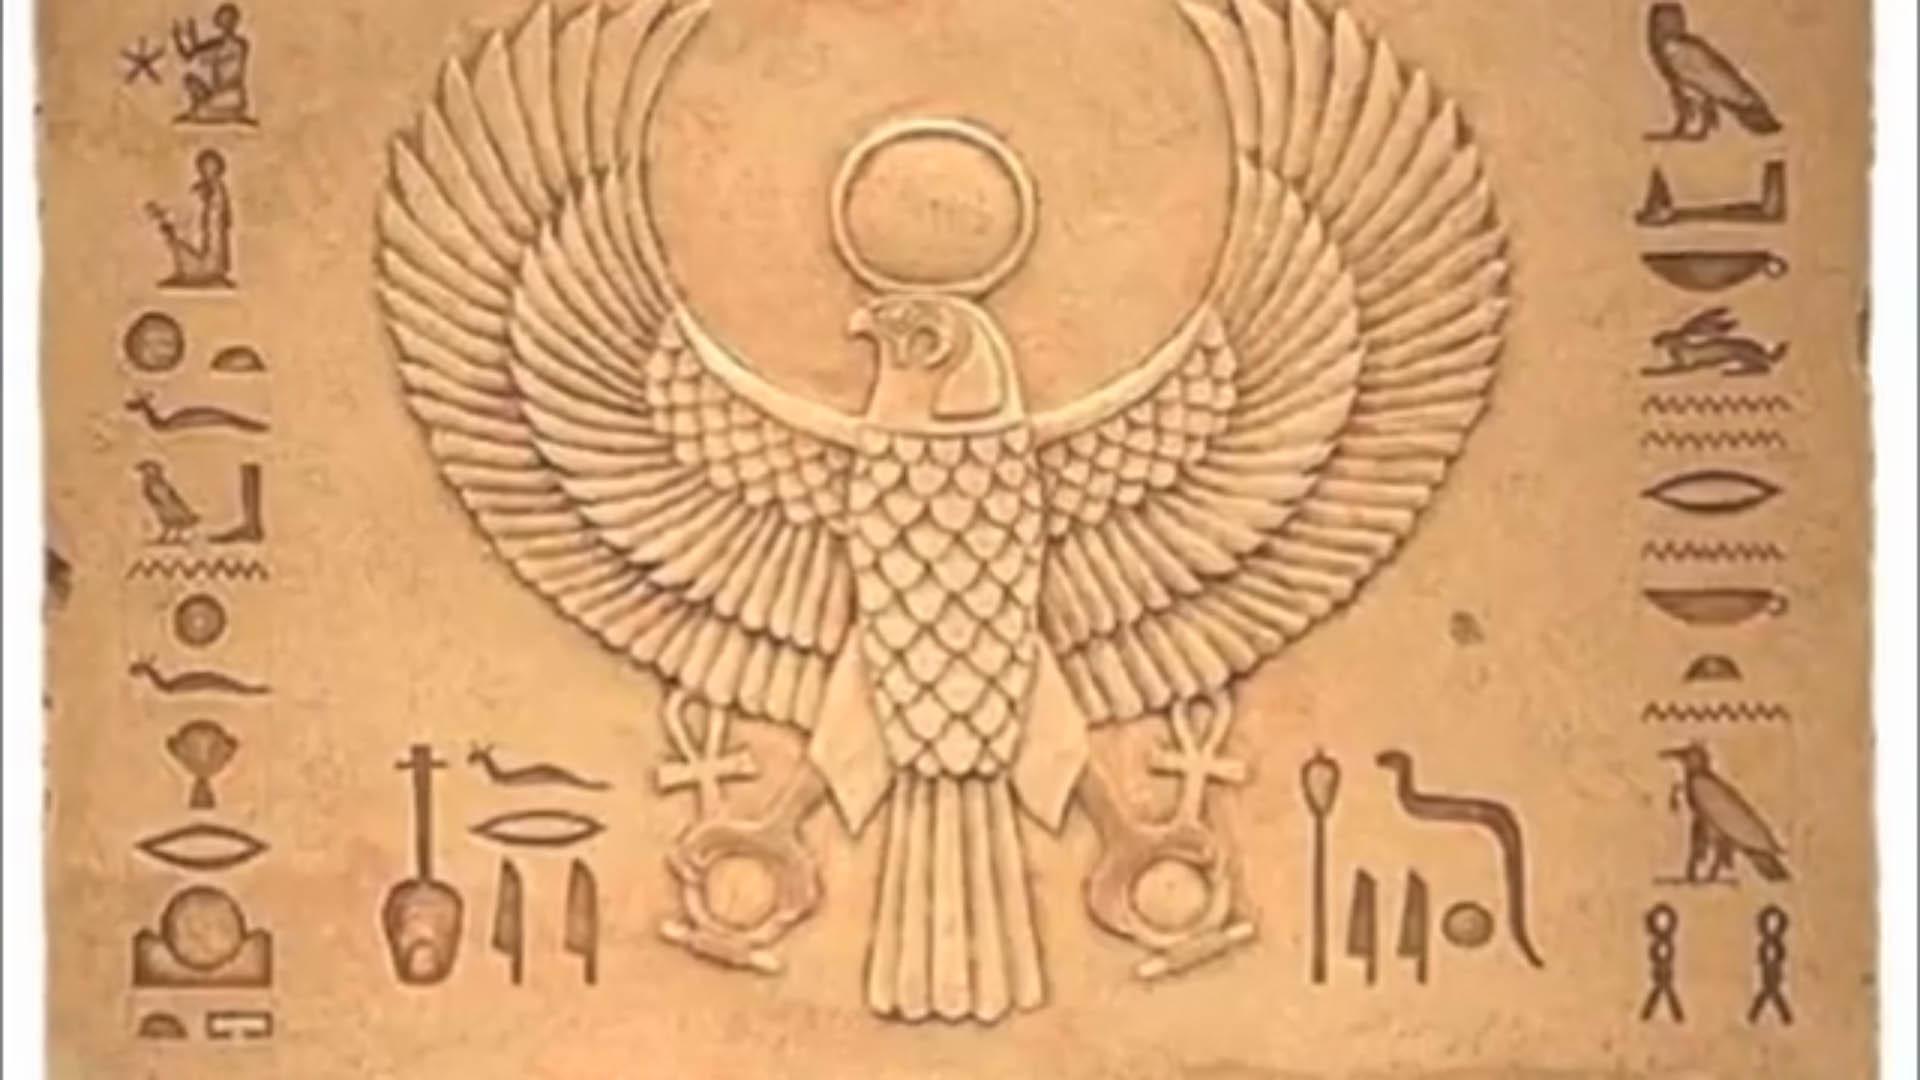 Egyptian god ra wallpaper more information djekova horus represented as a falcon egyptian god ra wallpaper buycottarizona